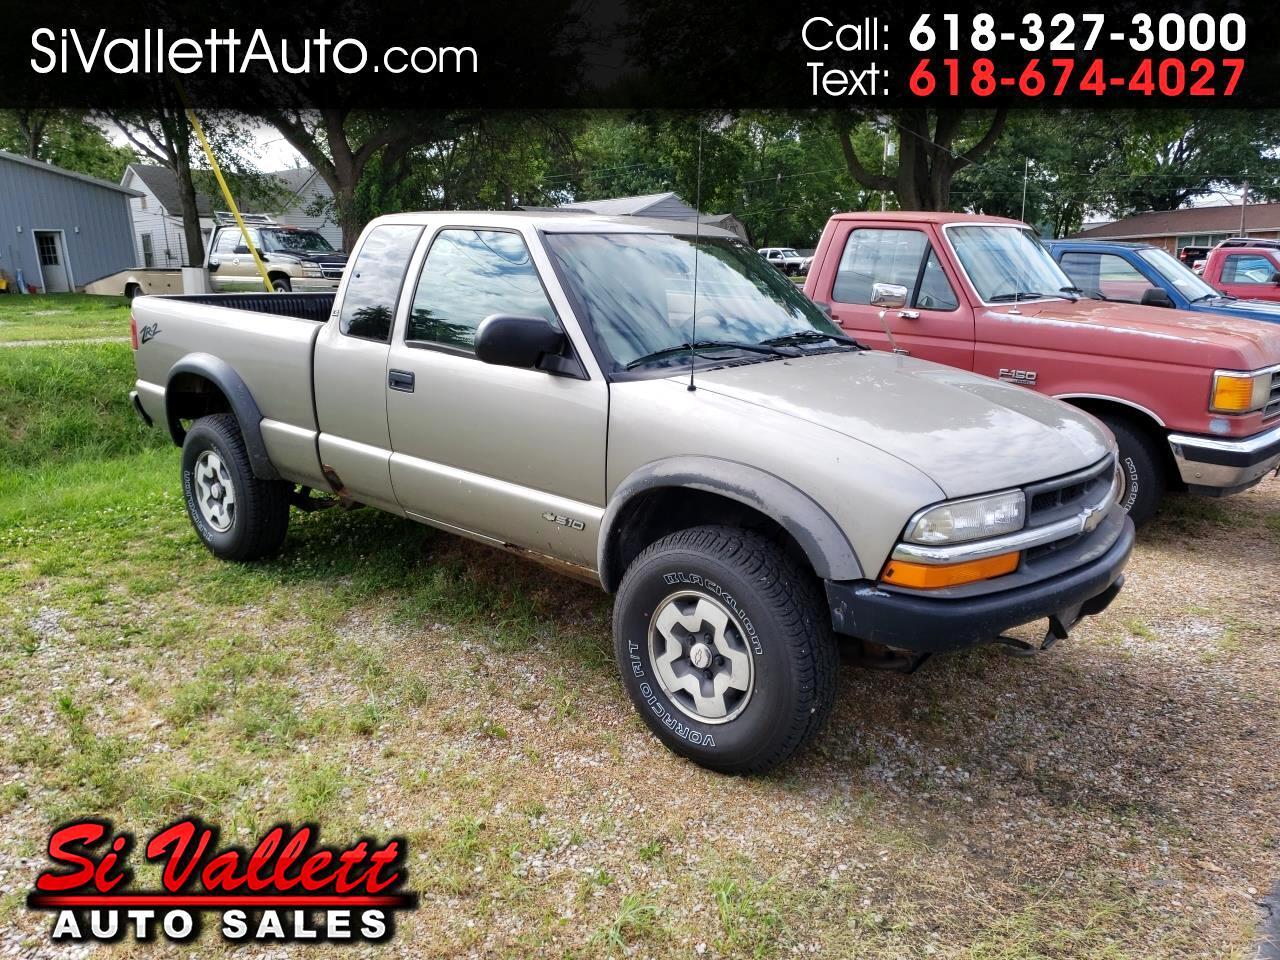 "Chevrolet S-10 Ext Cab 123"" WB 4WD LS w/ZR2 2000"